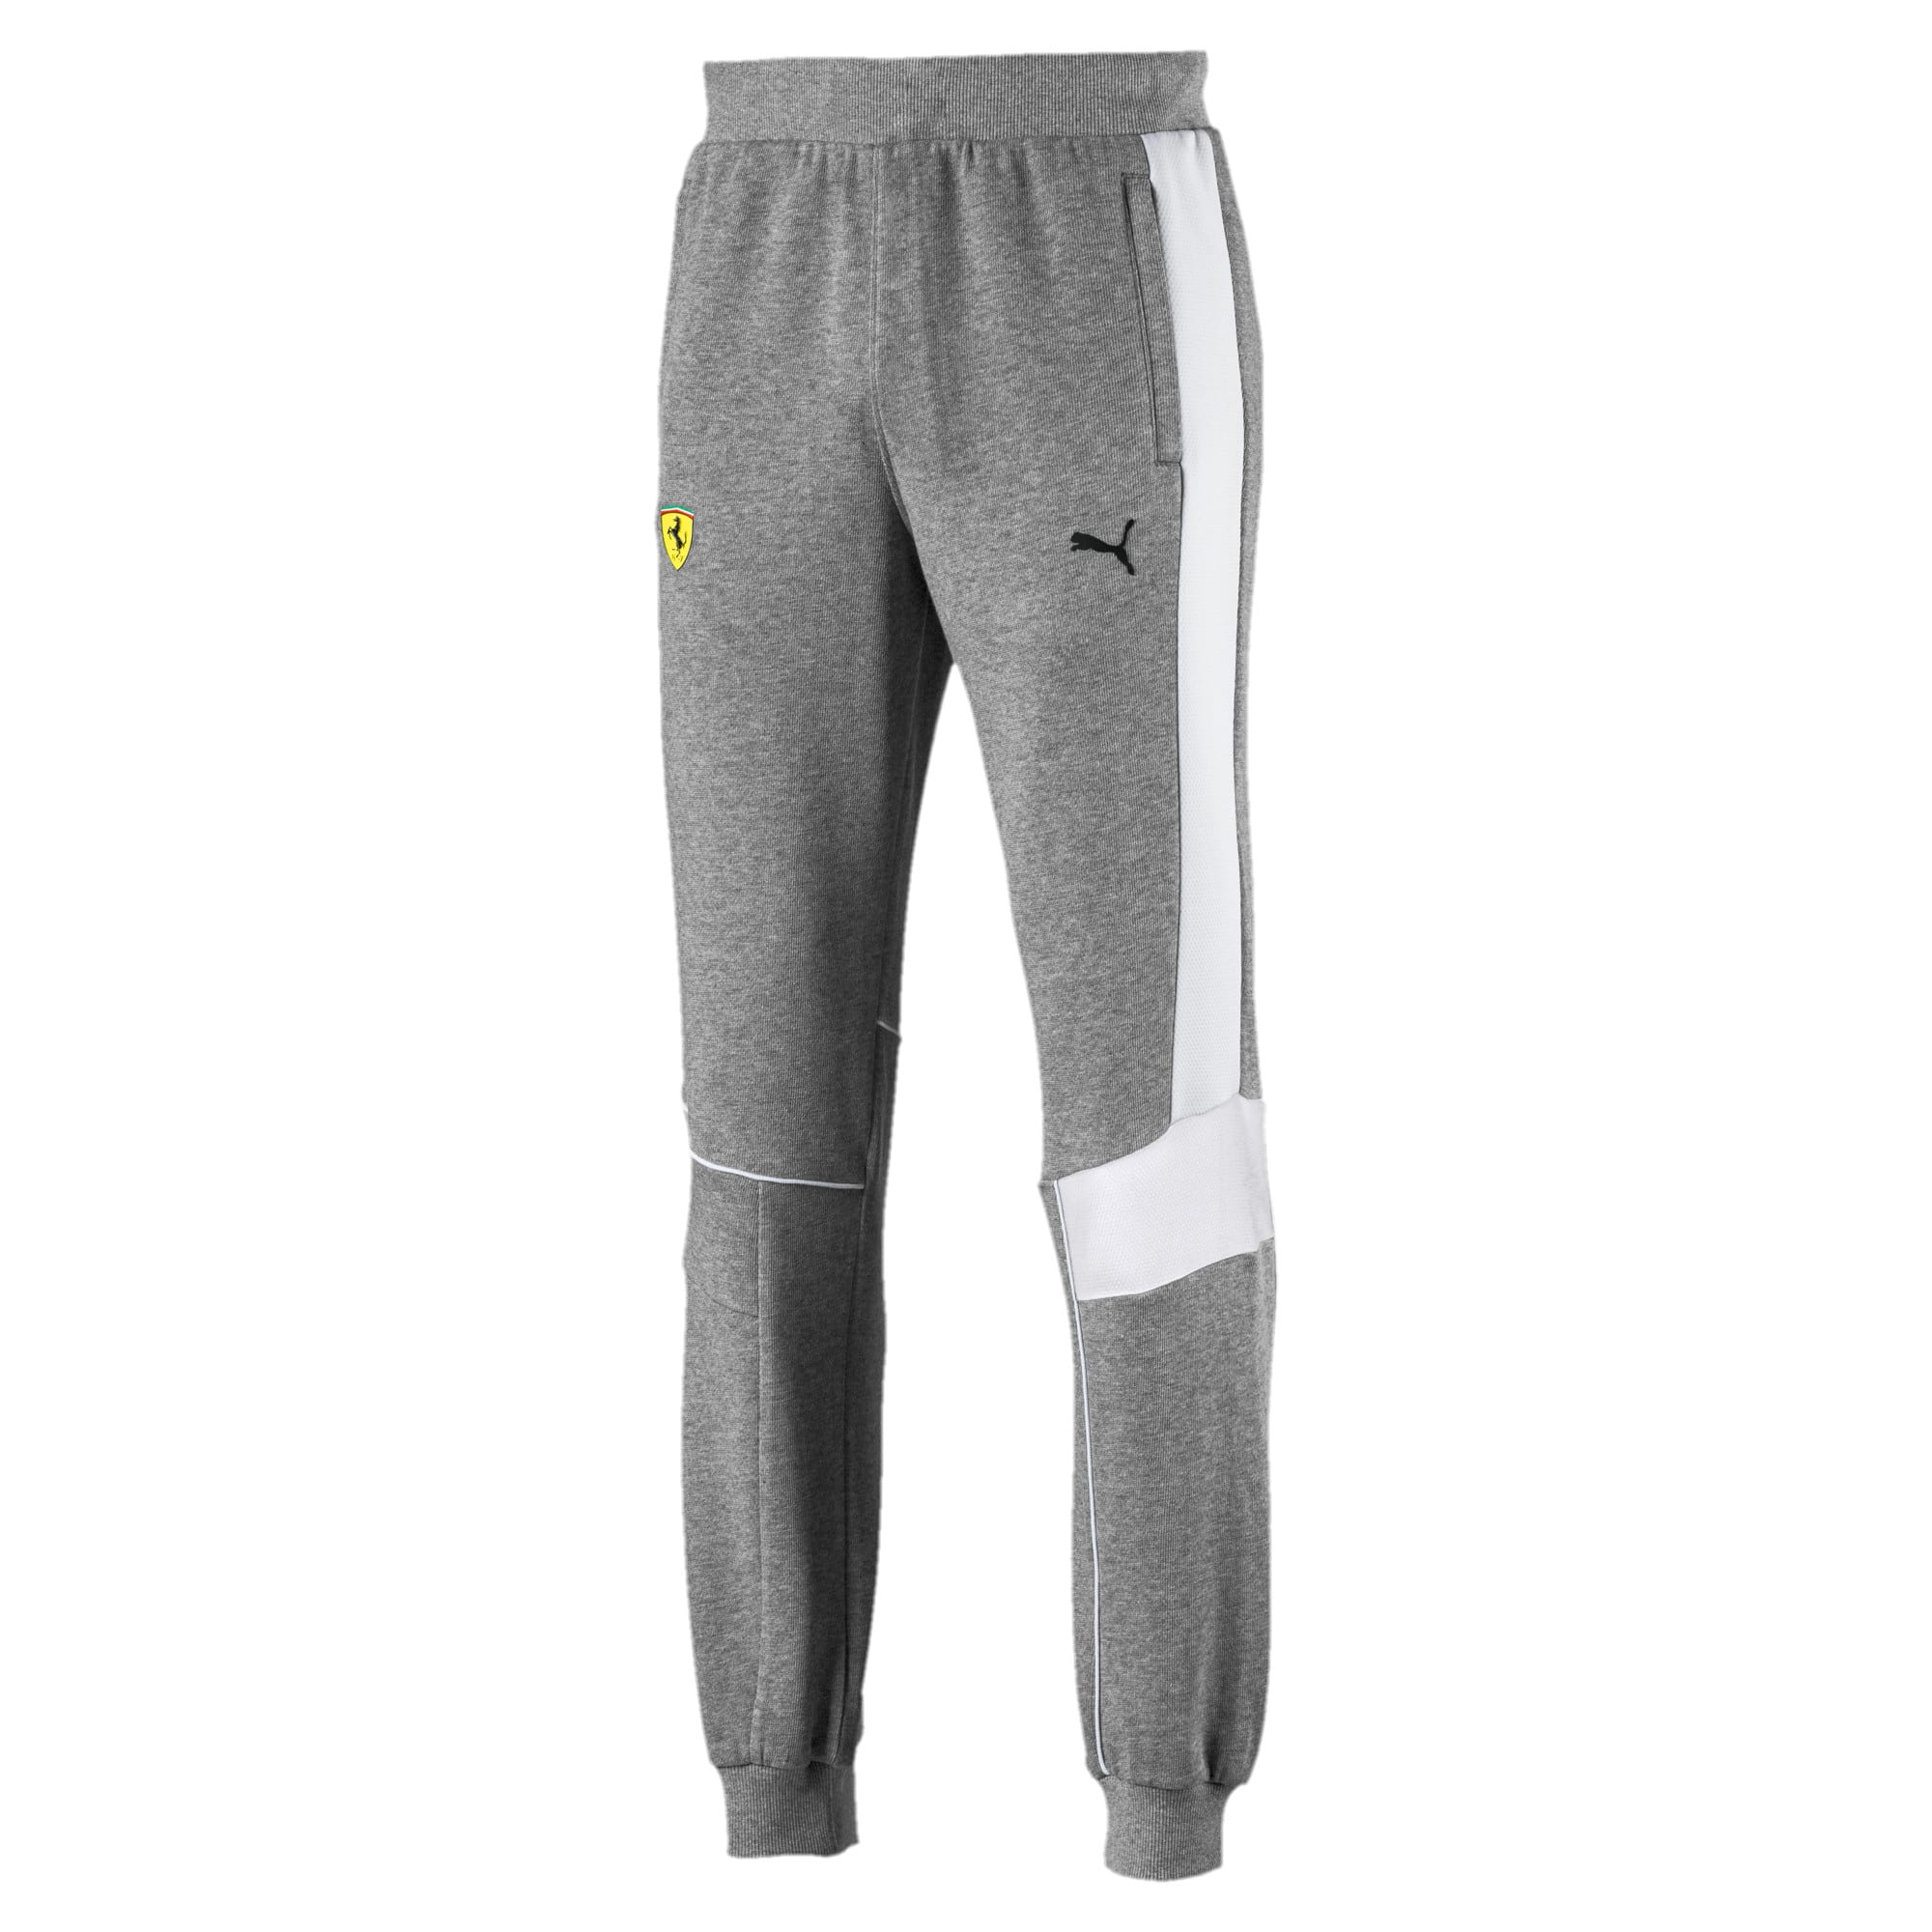 Thumbnail 4 of Pantalon en sweat en maille Ferrari pour homme, Medium Gray Heather, medium